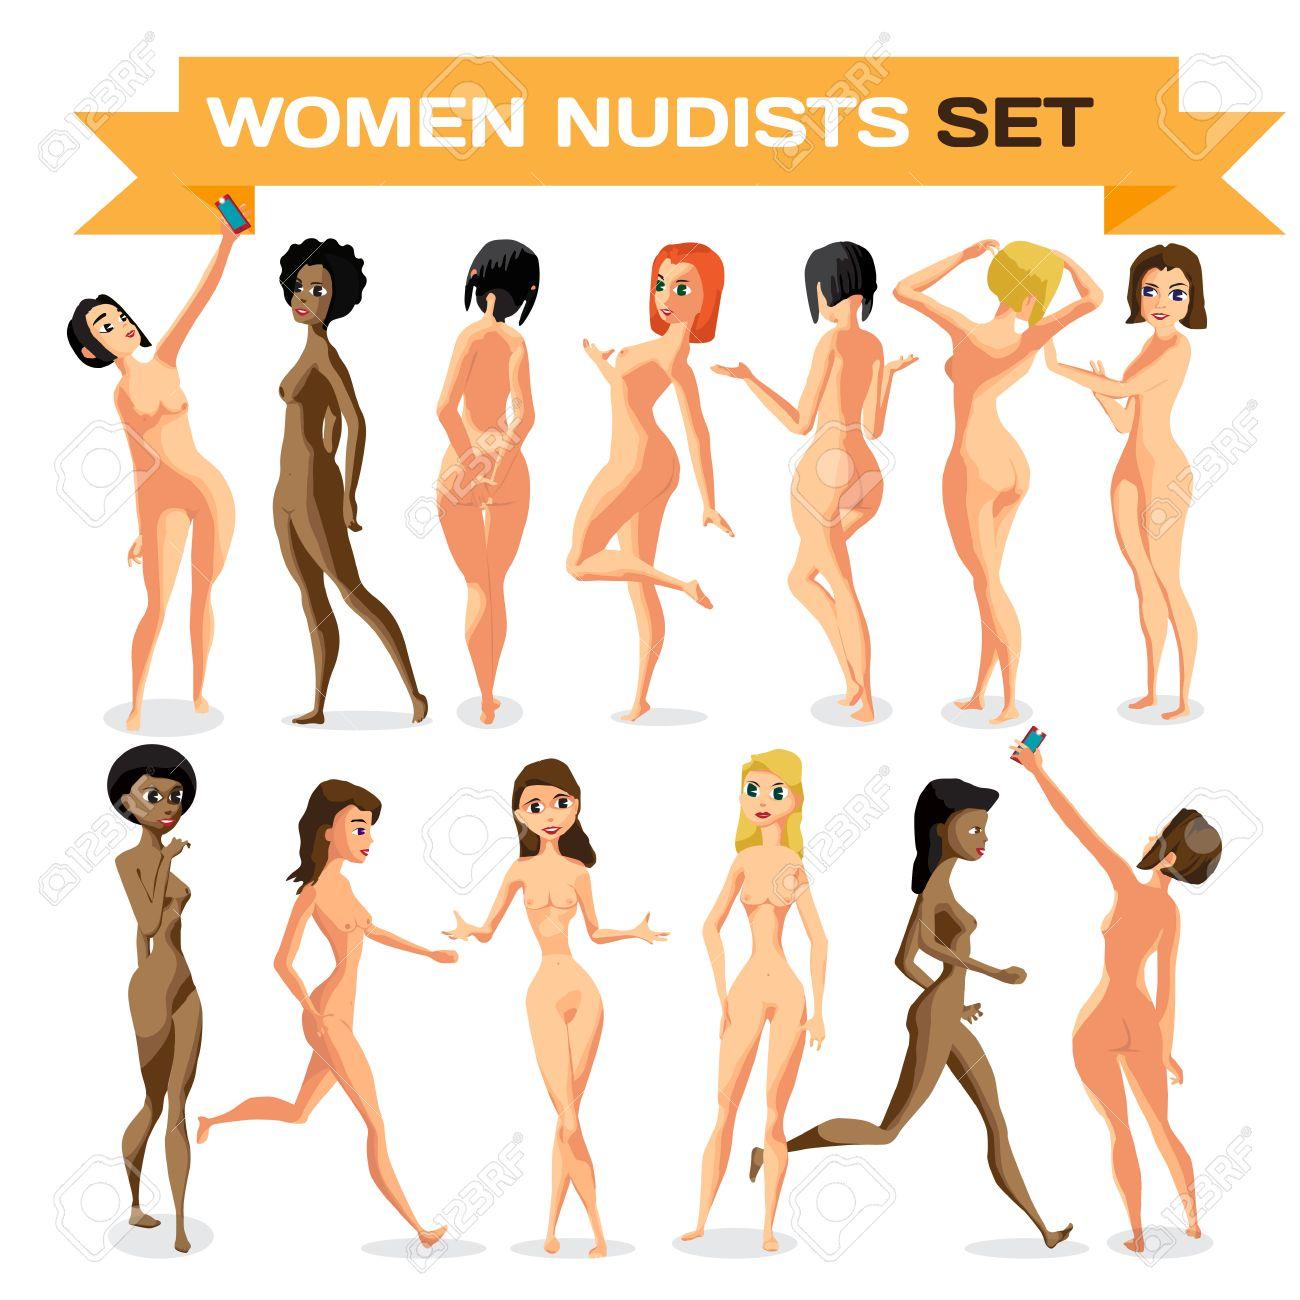 Nudisti ragazza nuda